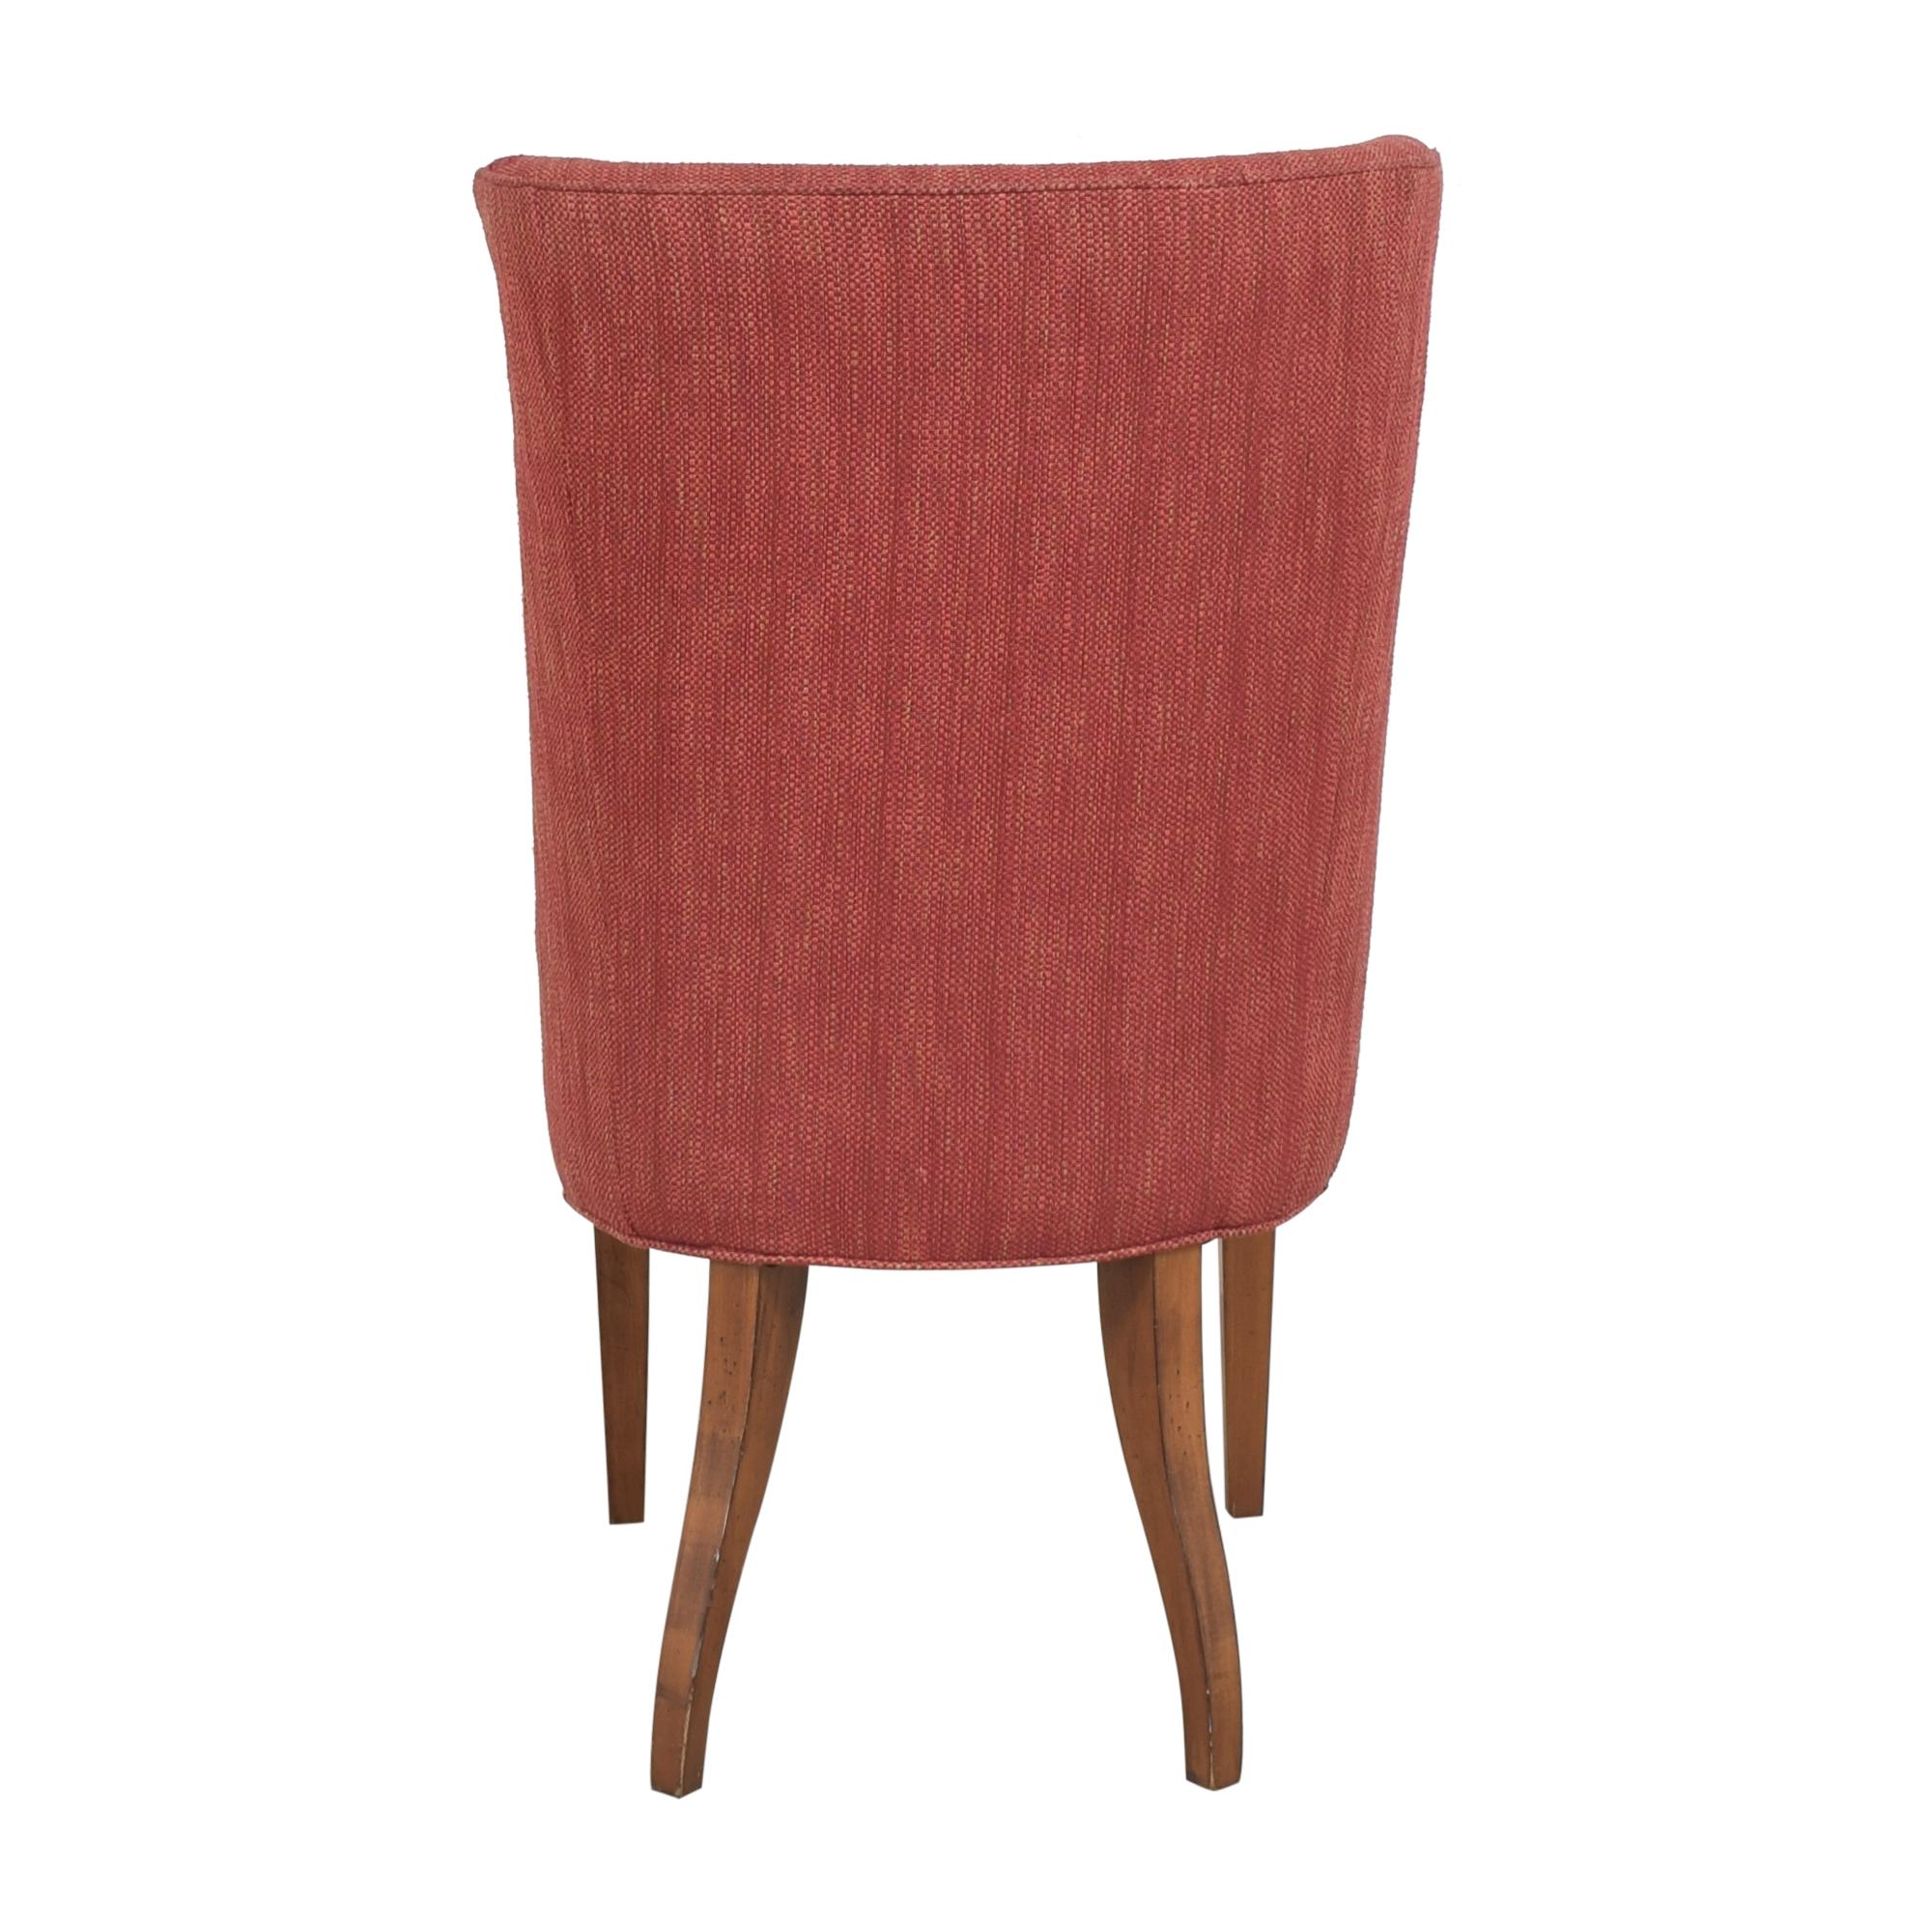 Liz Claiborne Liz Claiborne Tufted Accent Chair second hand